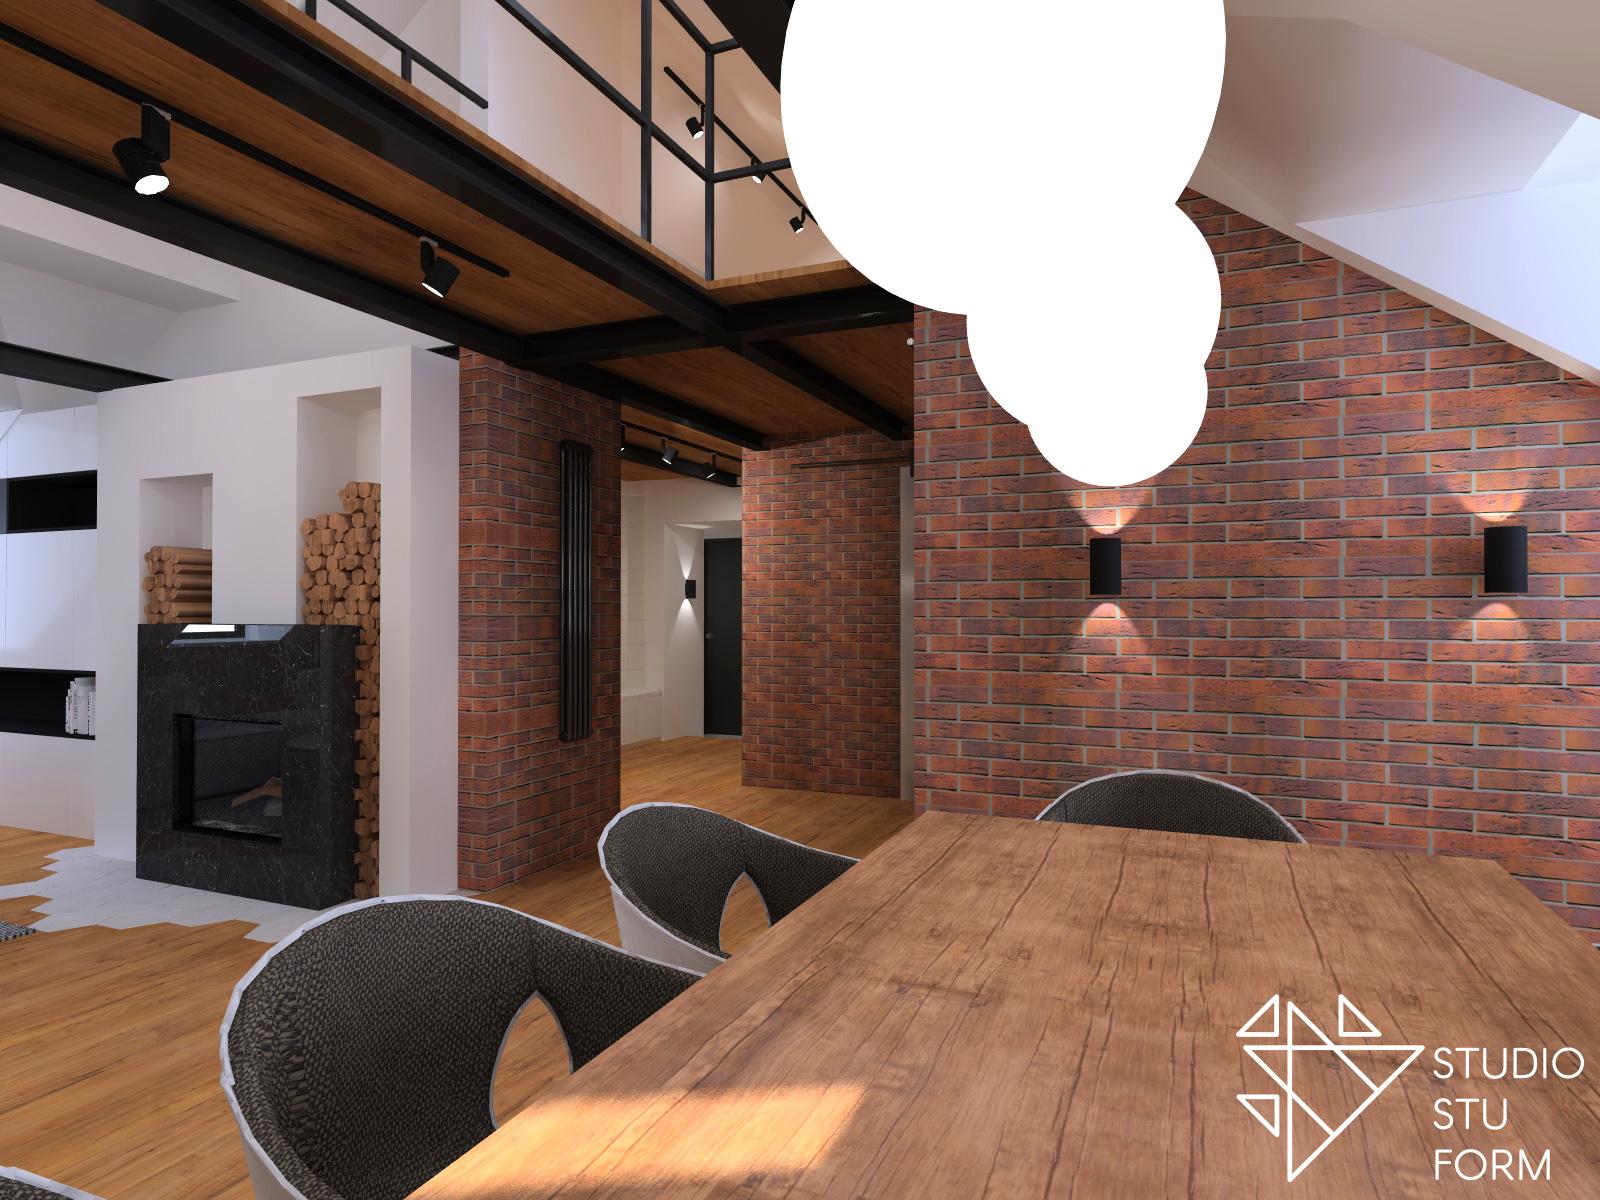 projekt loftowego mieszkania